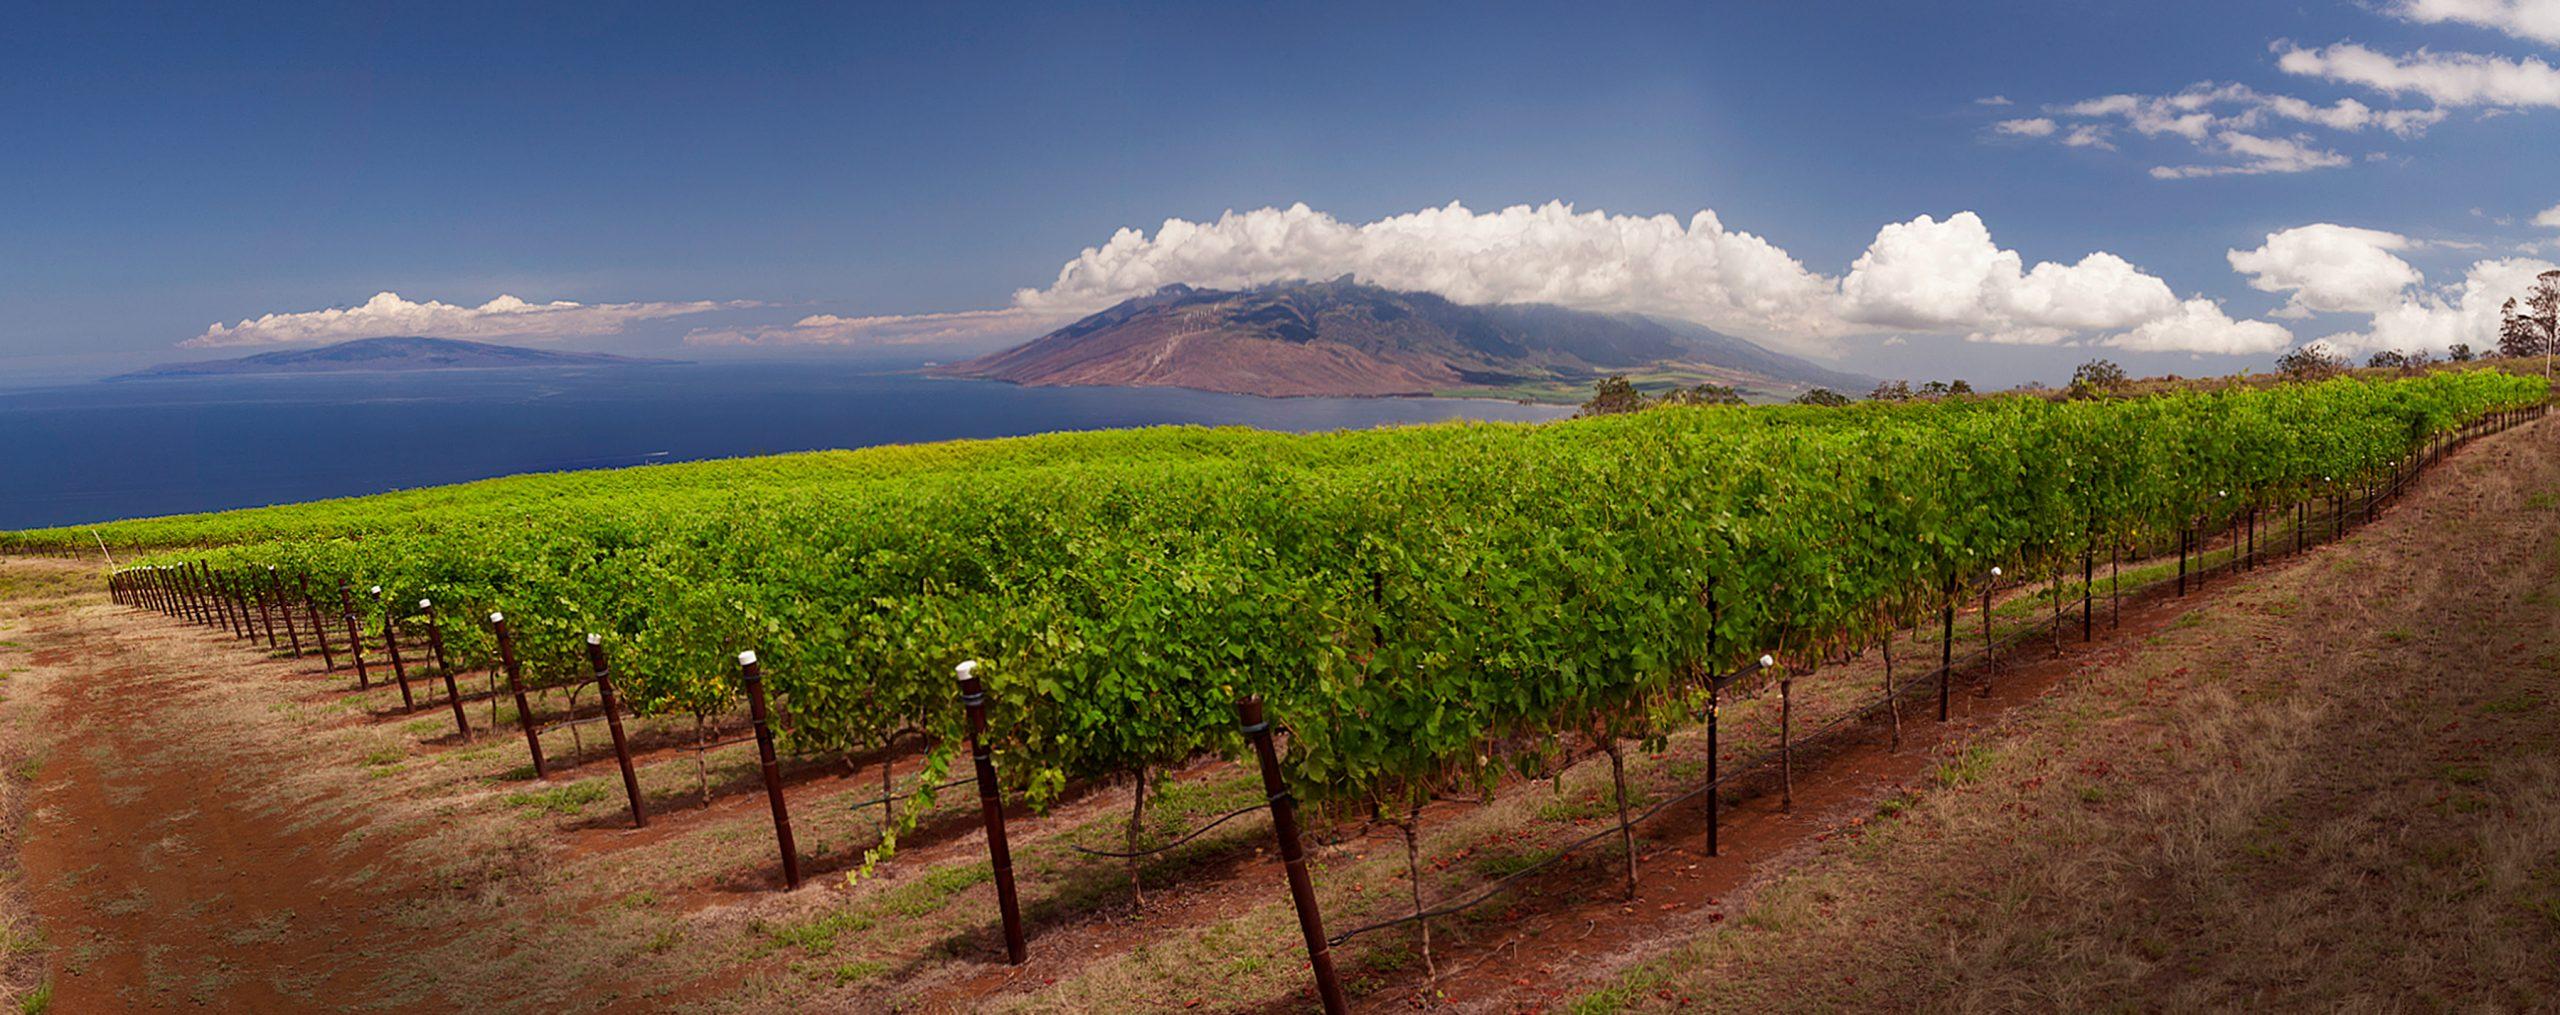 Terroir of Aloha: Syrah Finds Its Hawai'ian Home